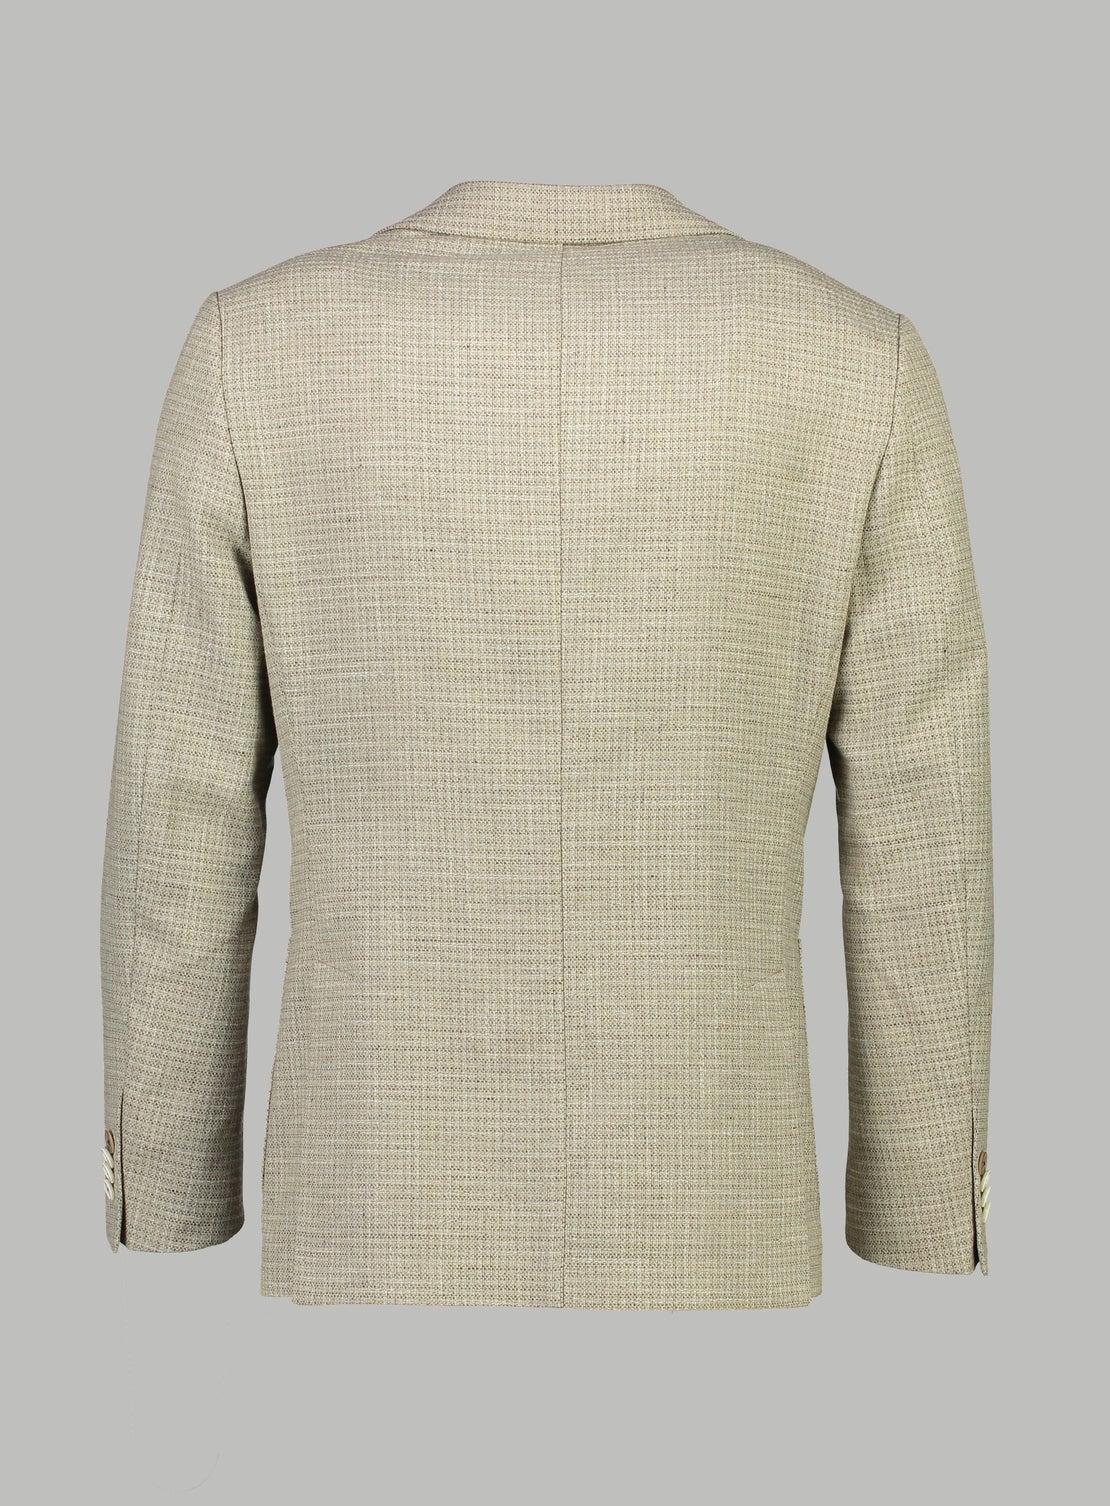 Gerd Taupe Textured Jacket